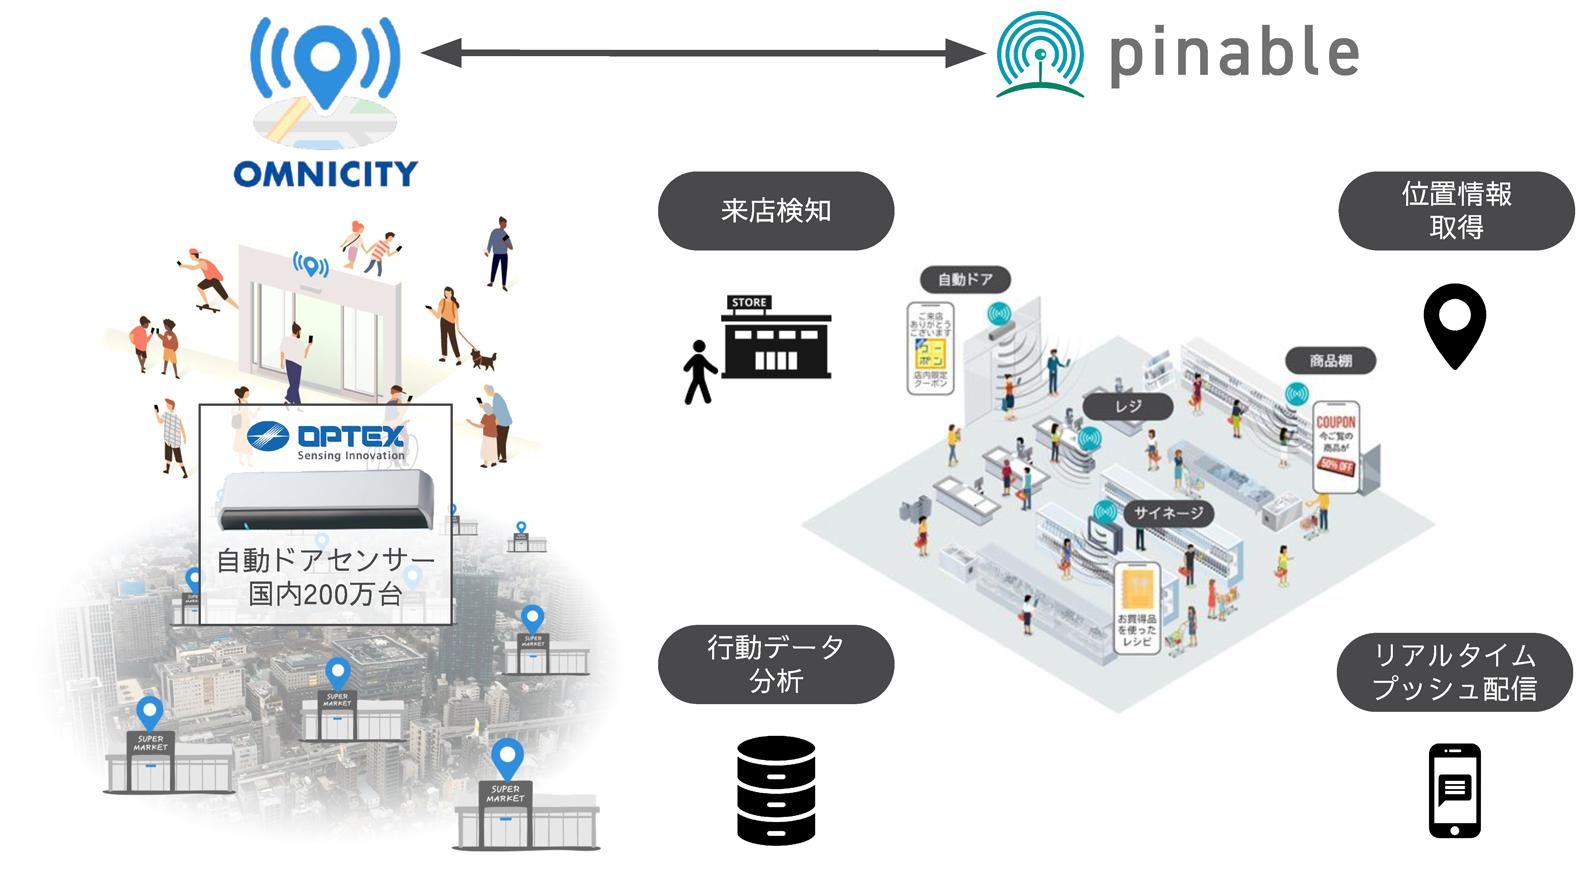 pinable × OMNICITYプラットフォーム